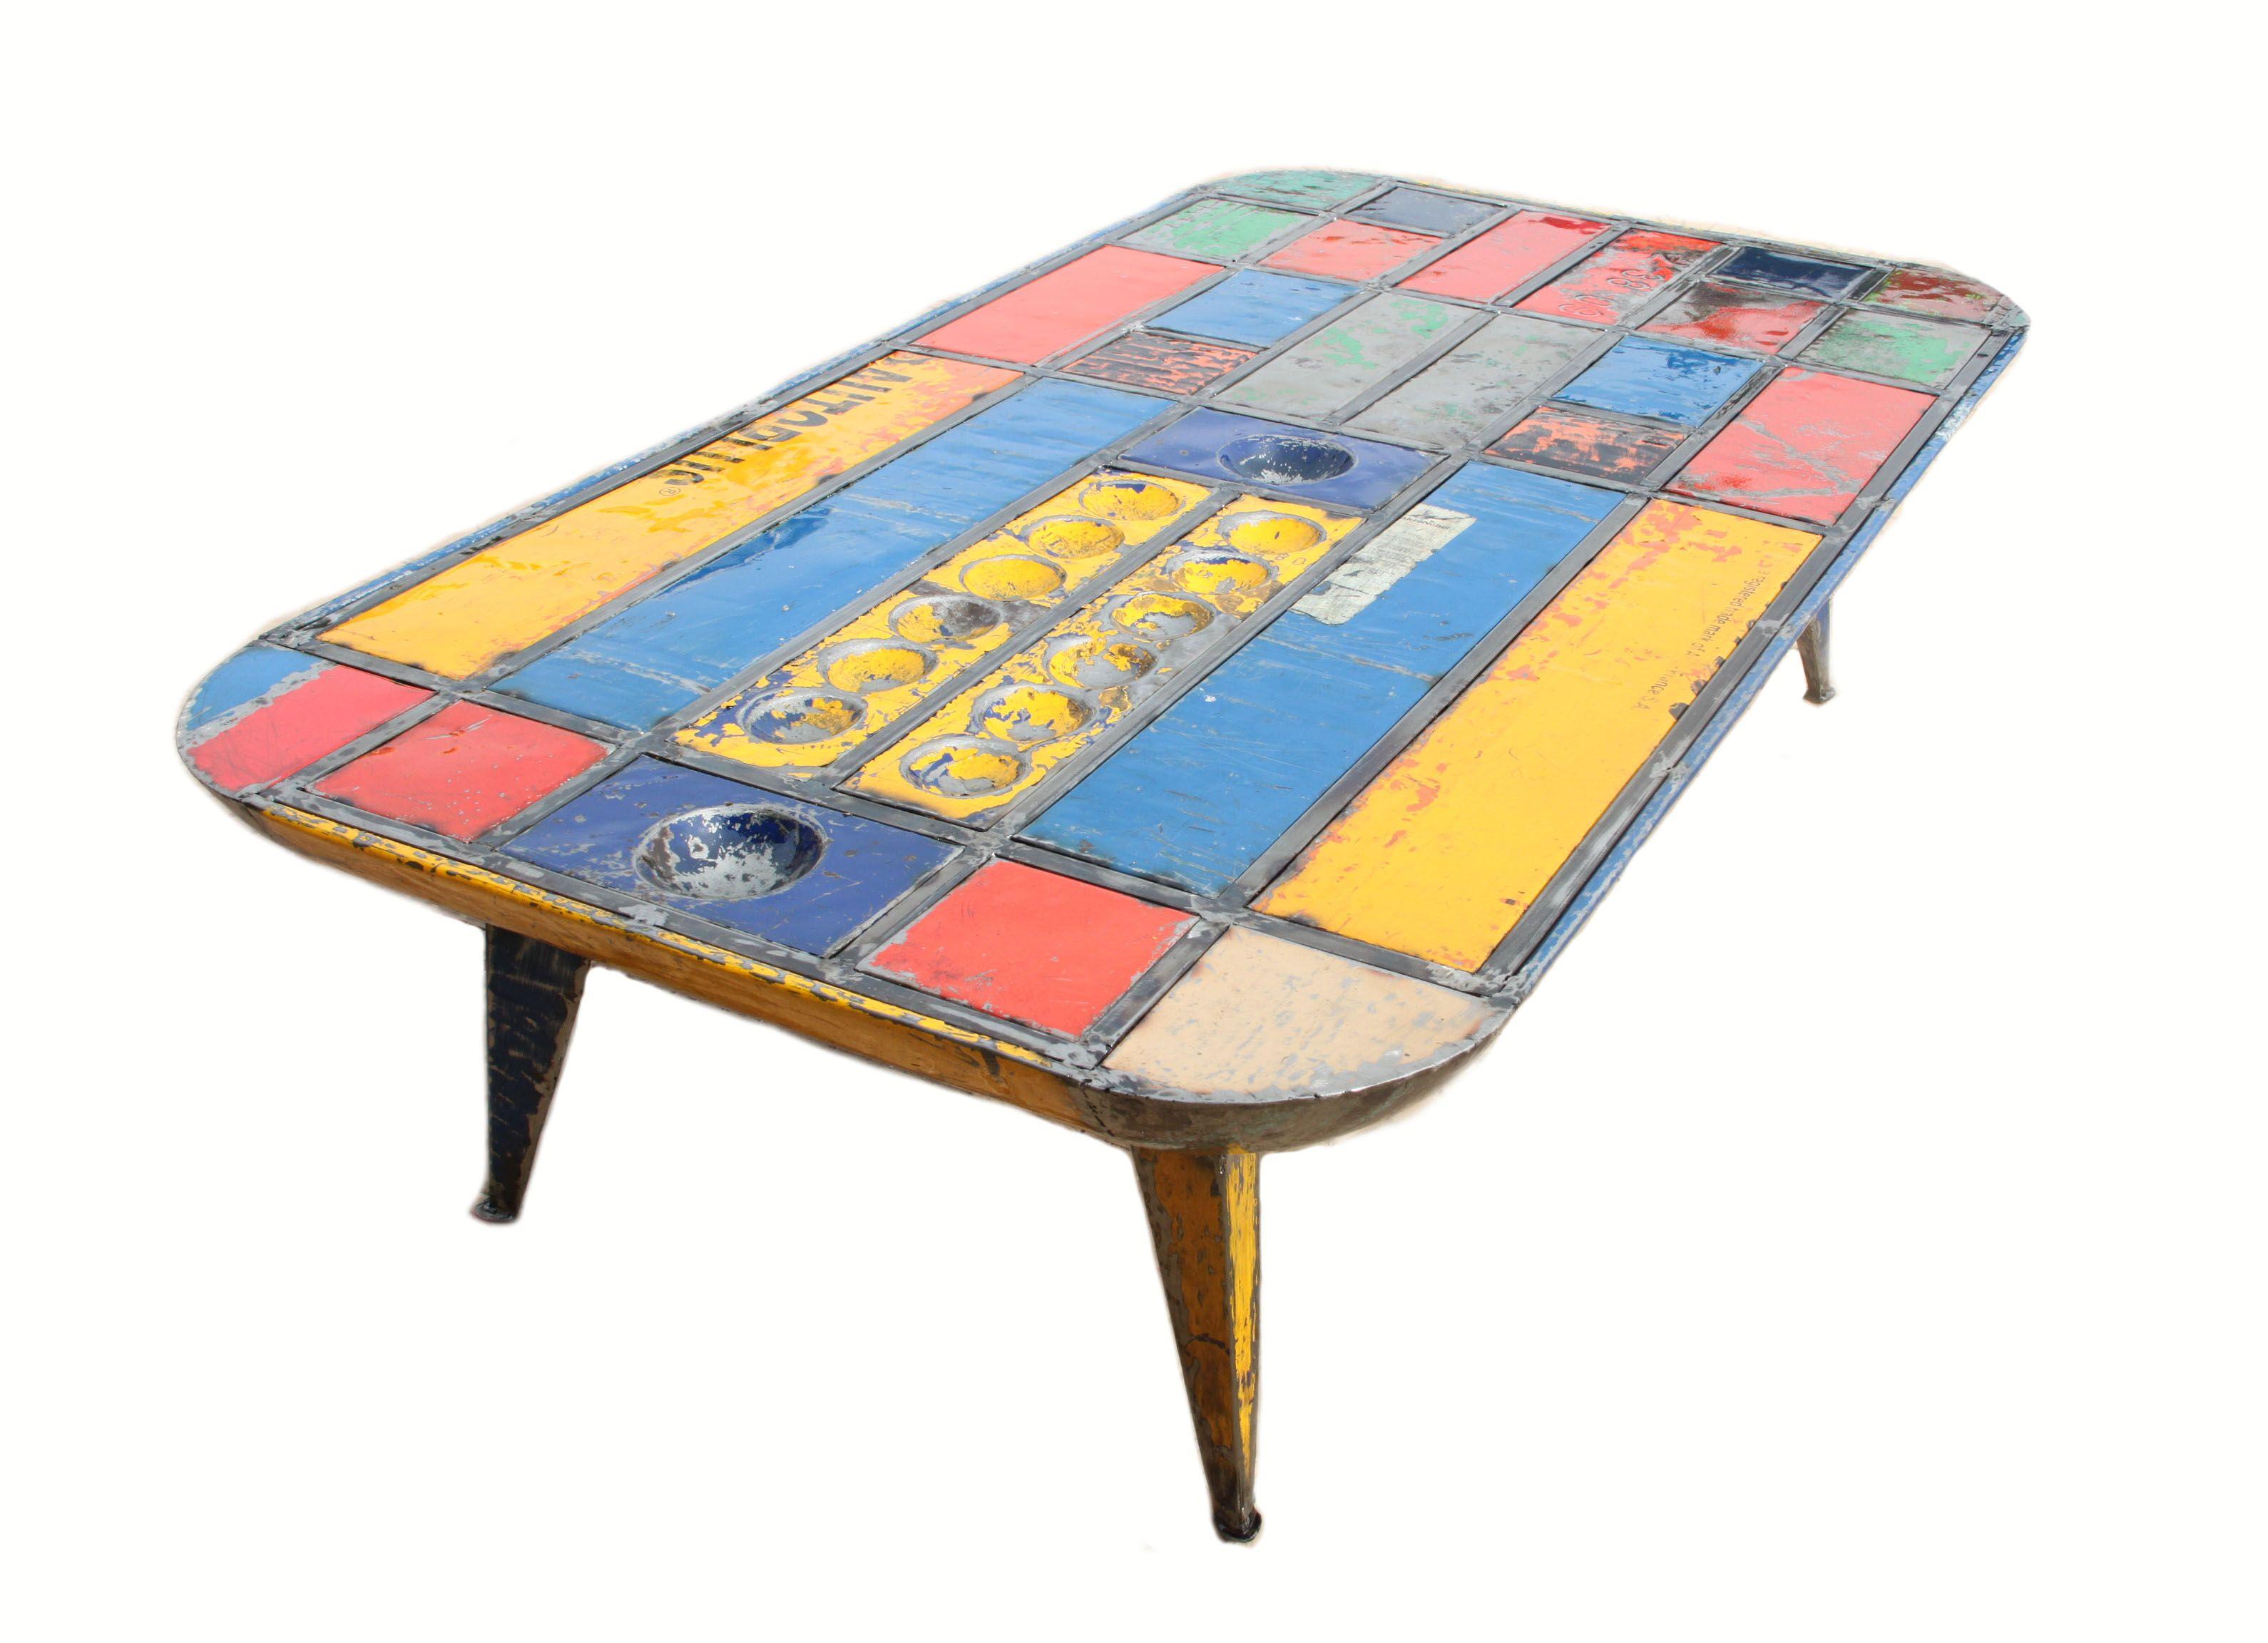 Hamed Design Hameddesign23 Yahoo Fr Www Coroflot Com Hamedouattara Chair Design Decor Design Wood And Metal